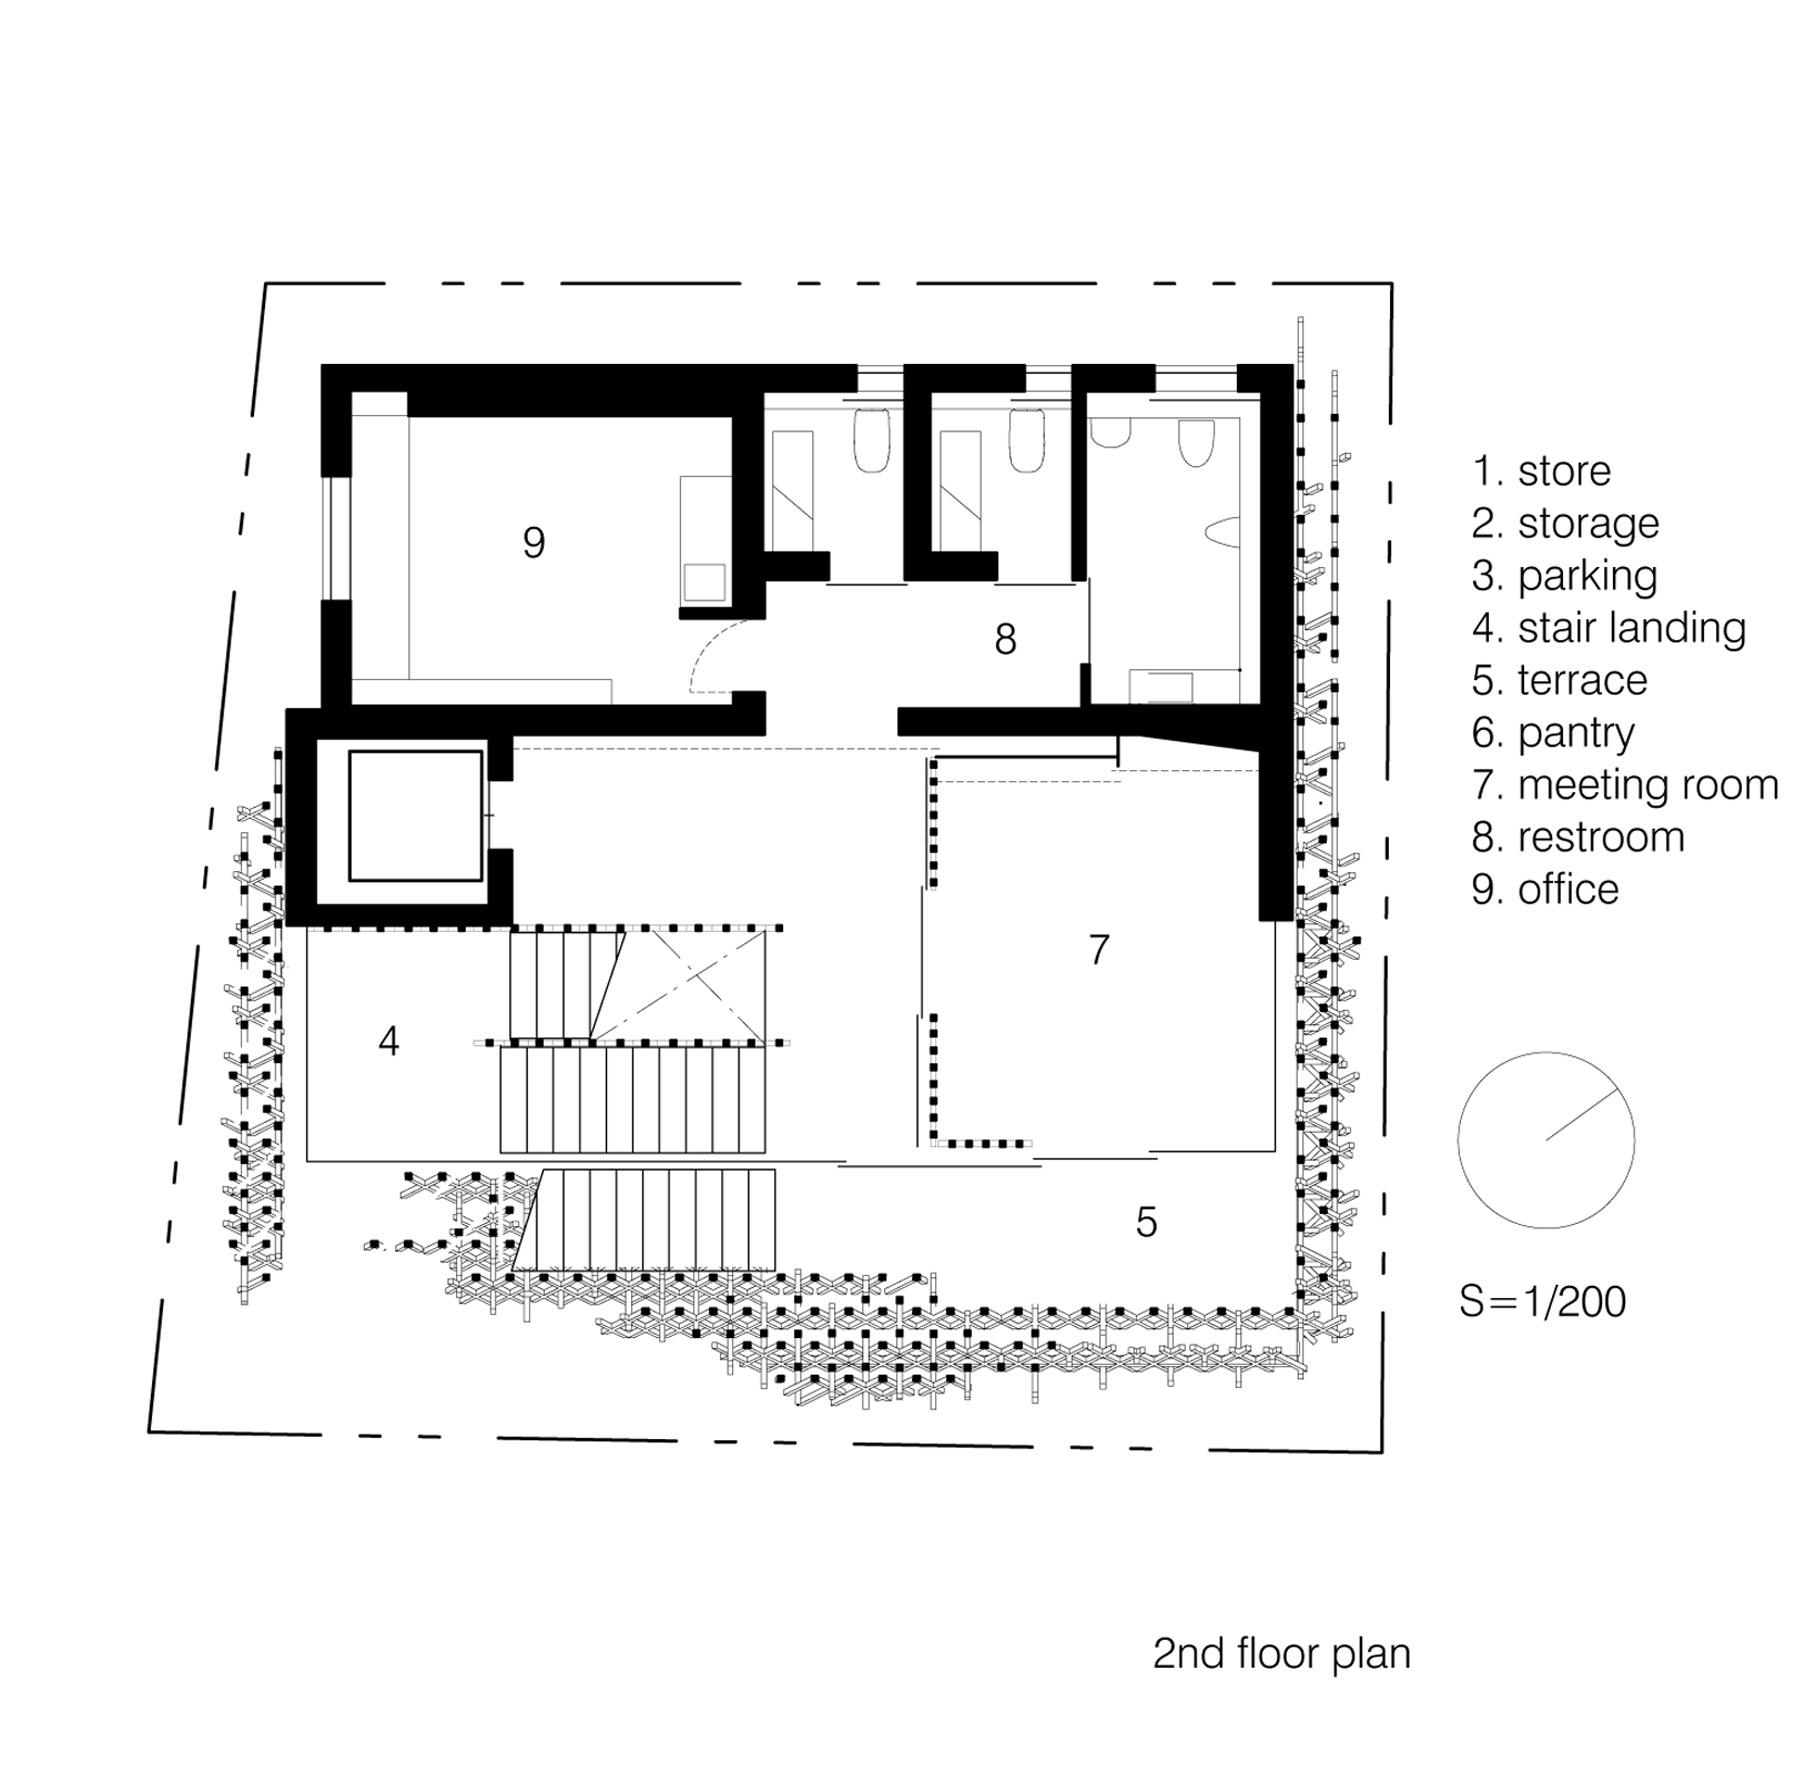 100 tadao ando floor plans first floor plan architecture sunnyhills at minami aoyama kengo kuma associates mooponto